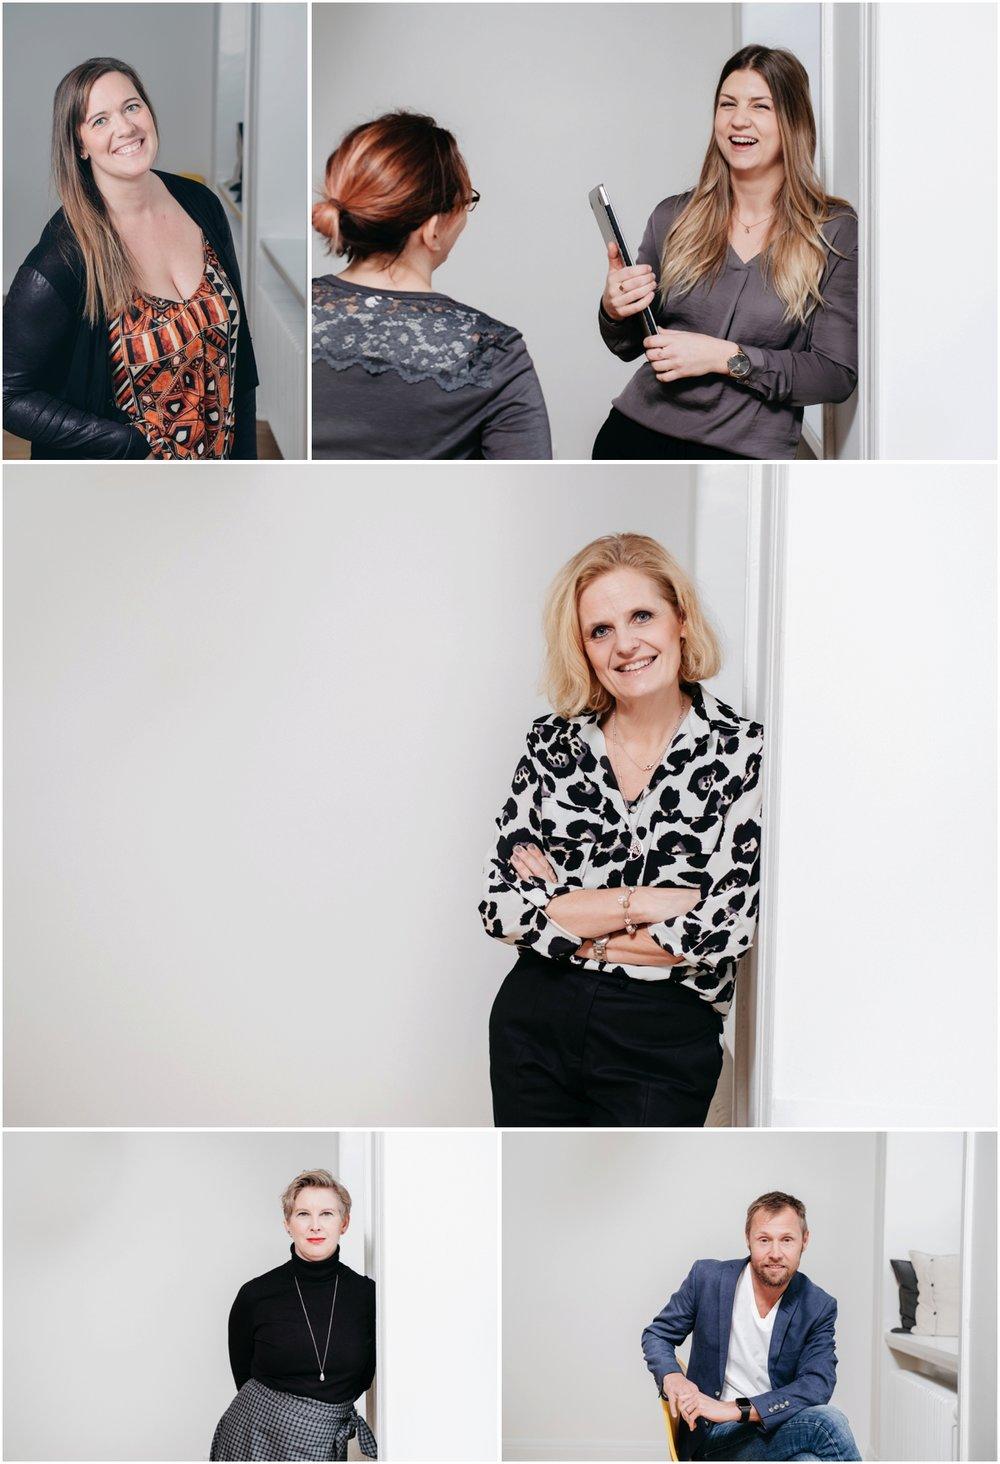 360You-photography-foretagsfotograf-foretagsportratt-stockholm-vallentuna-taby-bildbank-nackademin-personalportratt-4.jpg